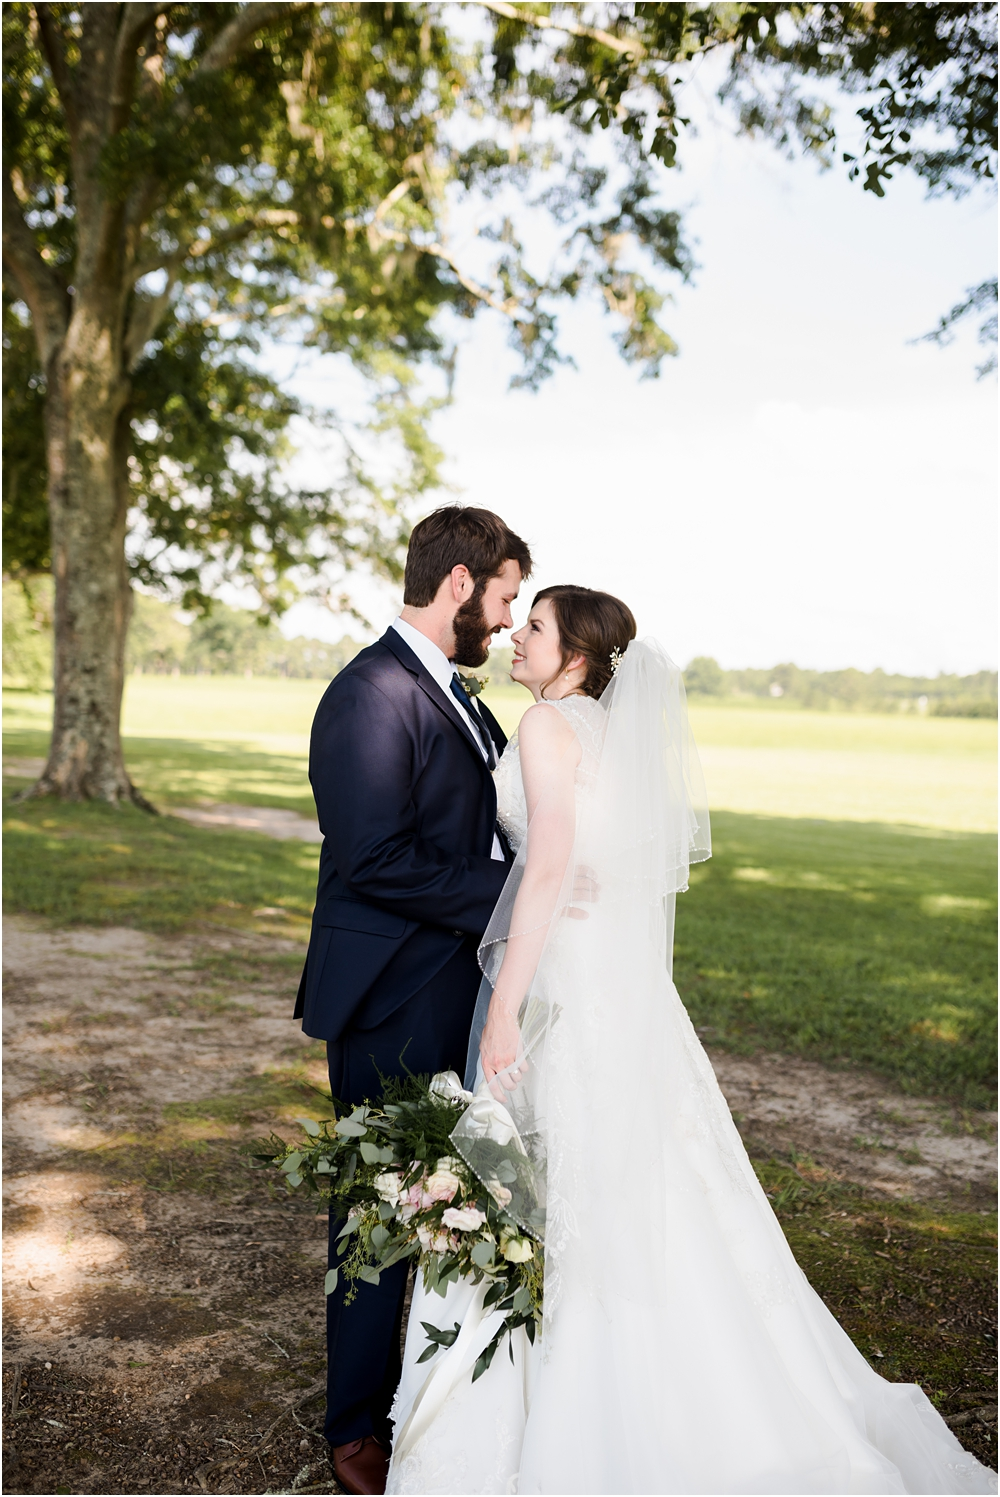 marianna-florida-wedding-photographer-kiersten-grant-61.jpg